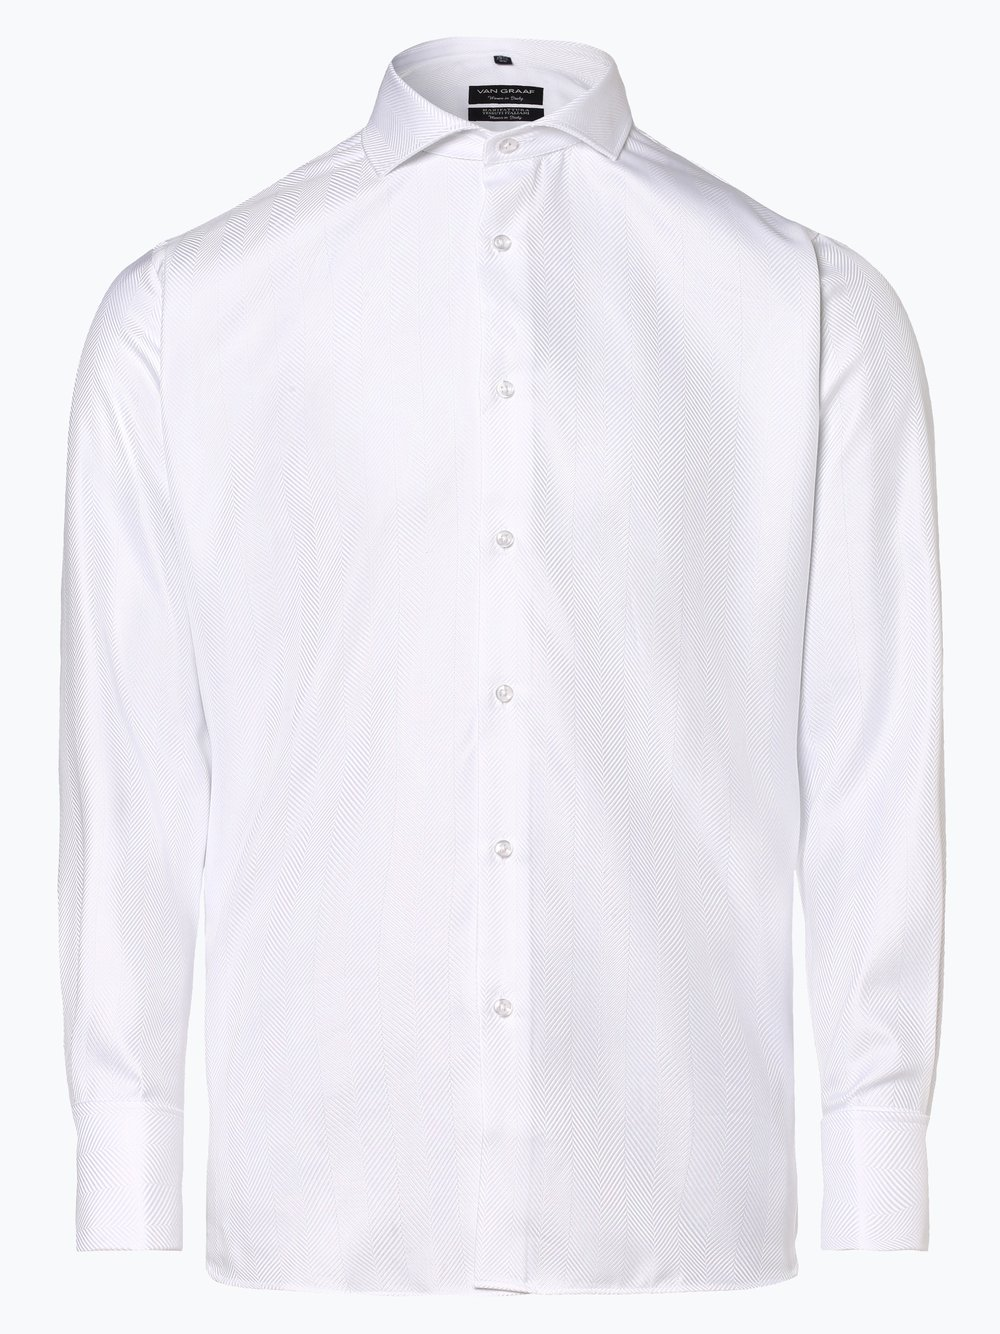 Van Graaf – Koszula męska z wywijanymi mankietami, biały Van Graaf 439076-0002